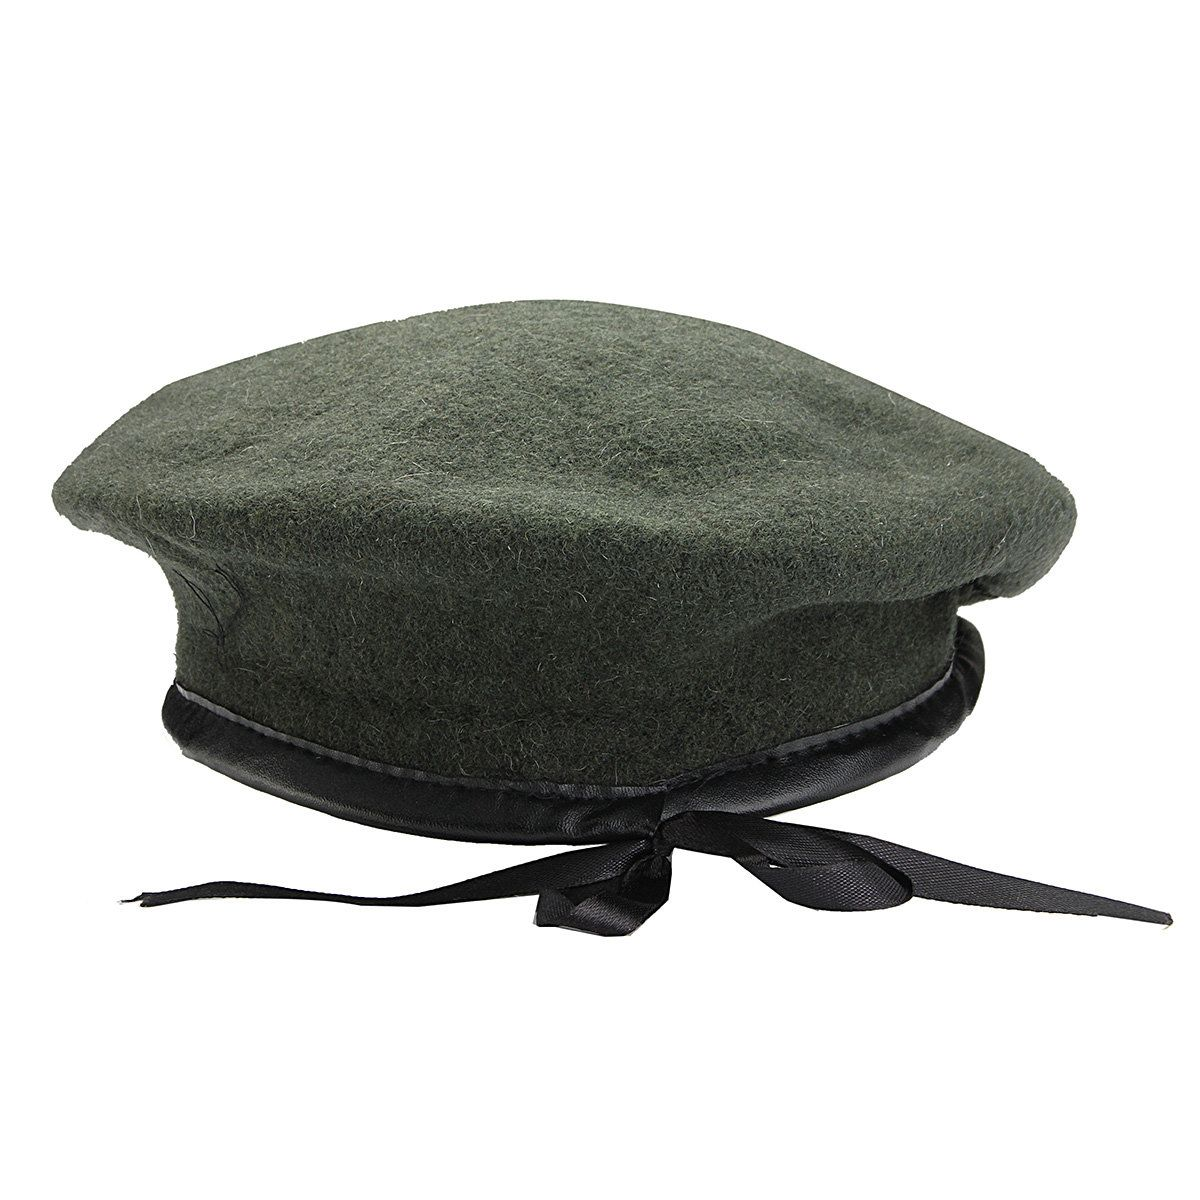 Men Women Military Soldier Army Hat Wool Solid Beret Beanie Cap ... 52dcdcb45b